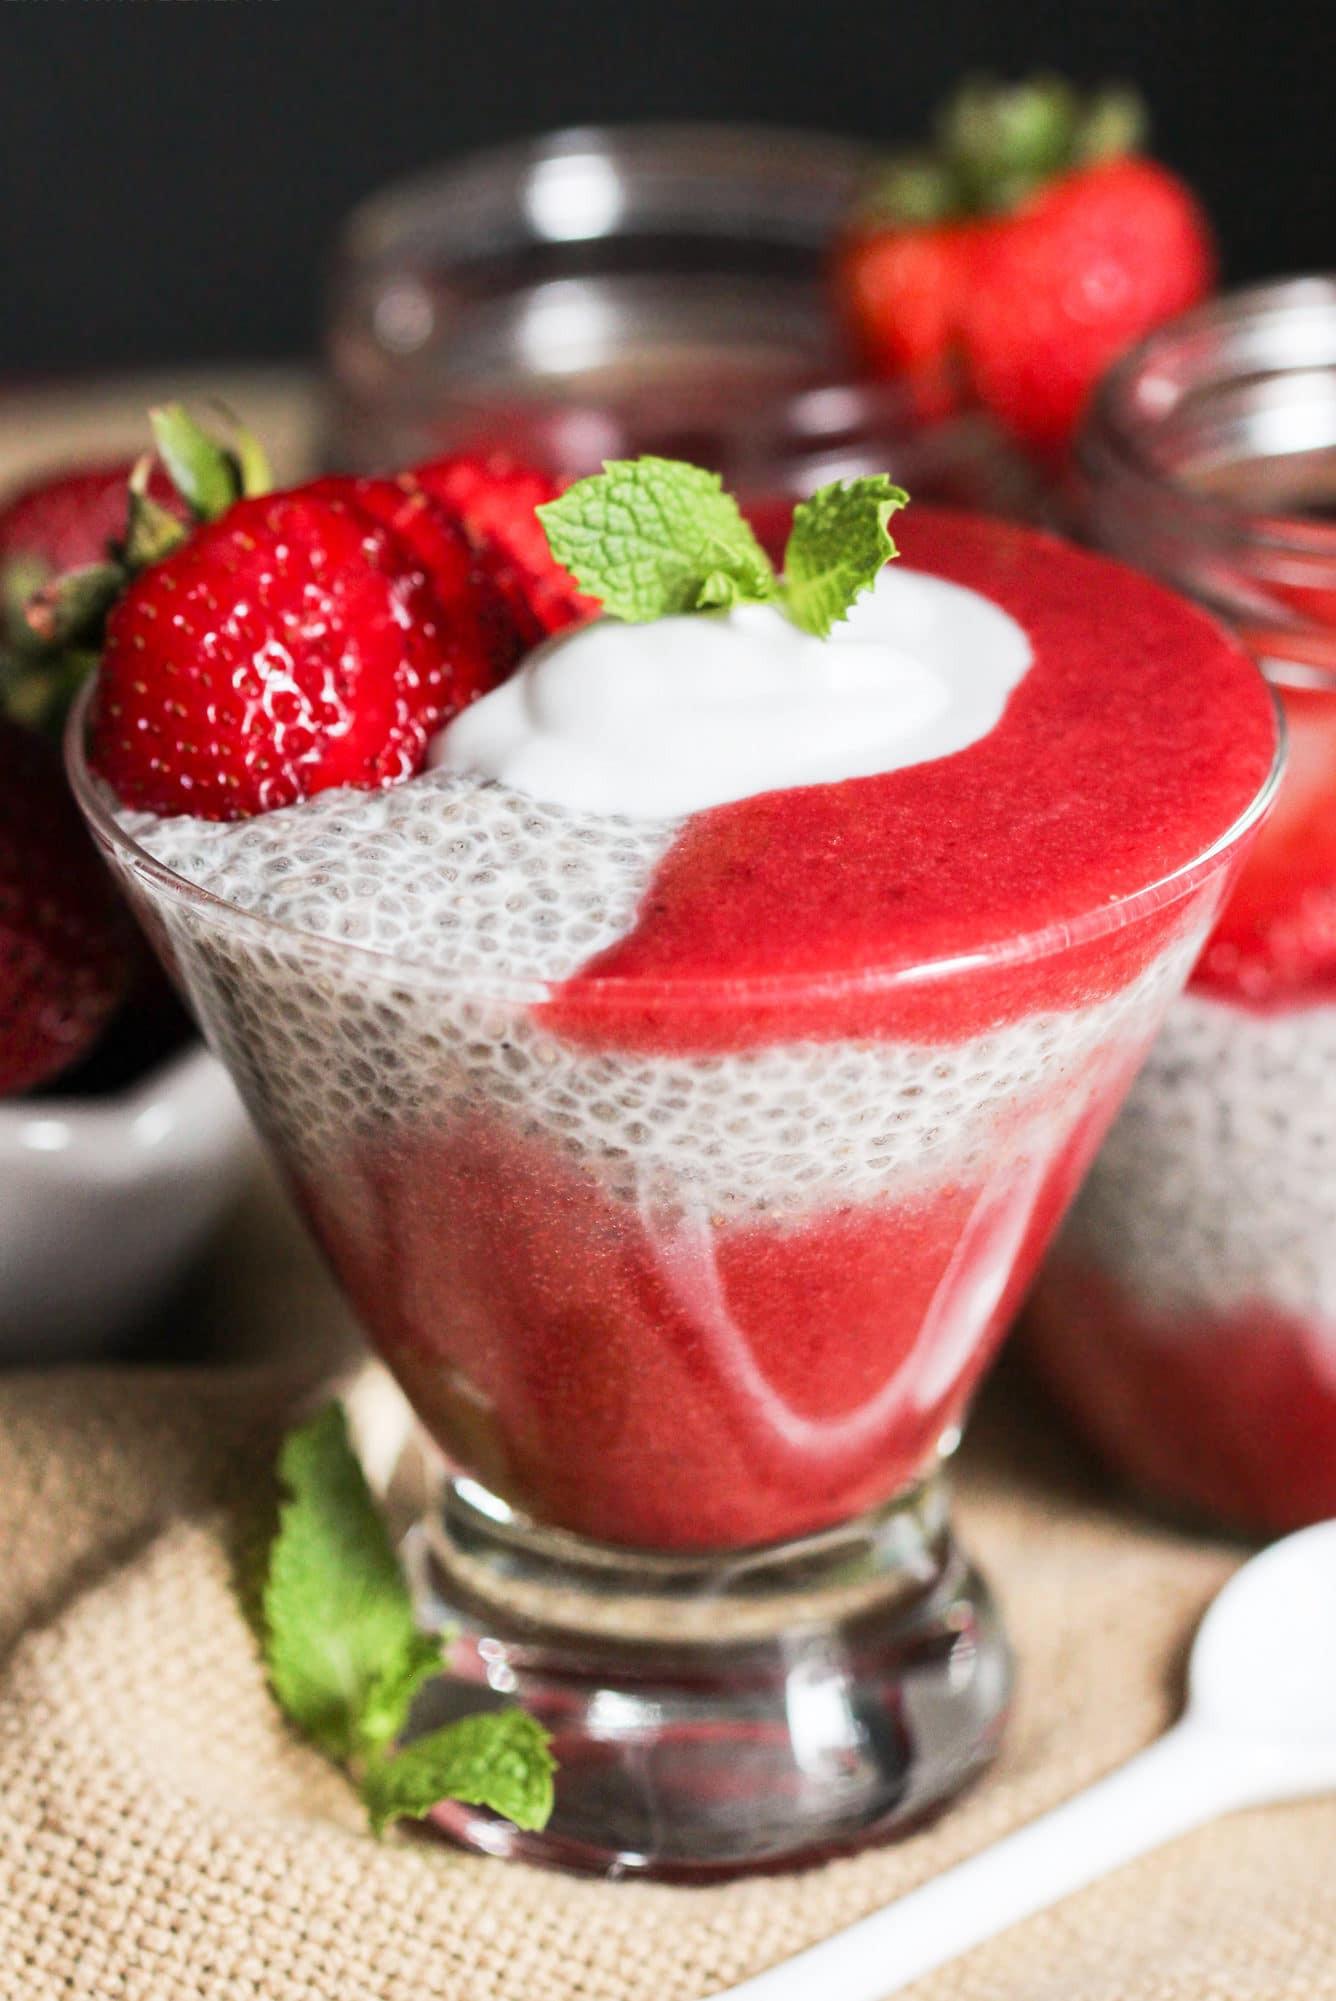 Healthy Low Fat Desserts  Easy Strawberry Vanilla Chia Seed Pudding Recipe